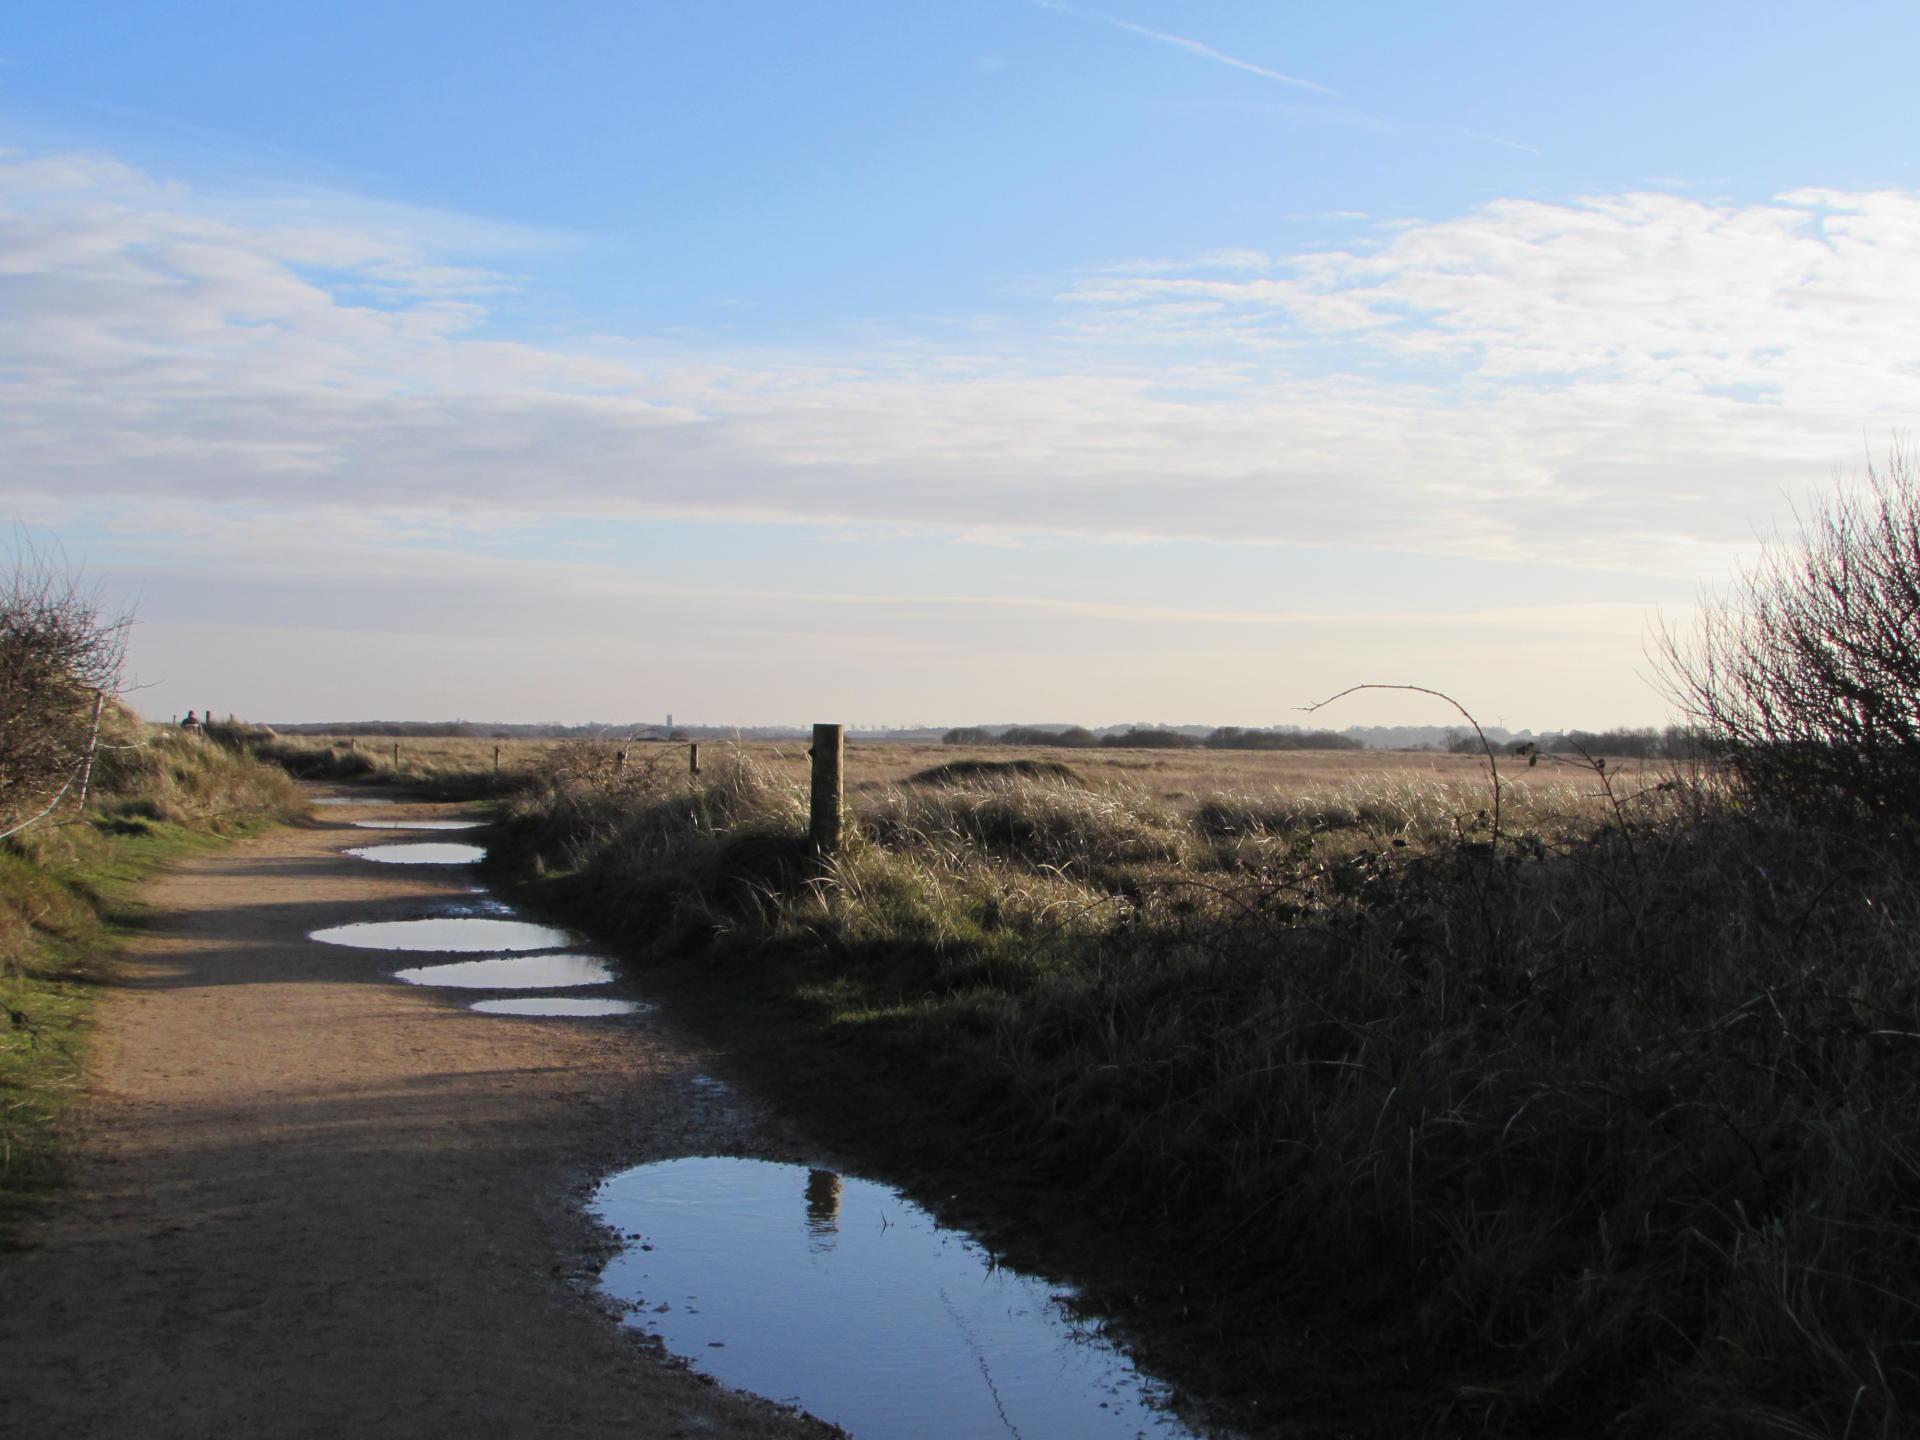 Seal Watching in North Norfolk - Yesihaveablog | Horsey Gap | Norfolk - Life in a Fine City | Winterlust